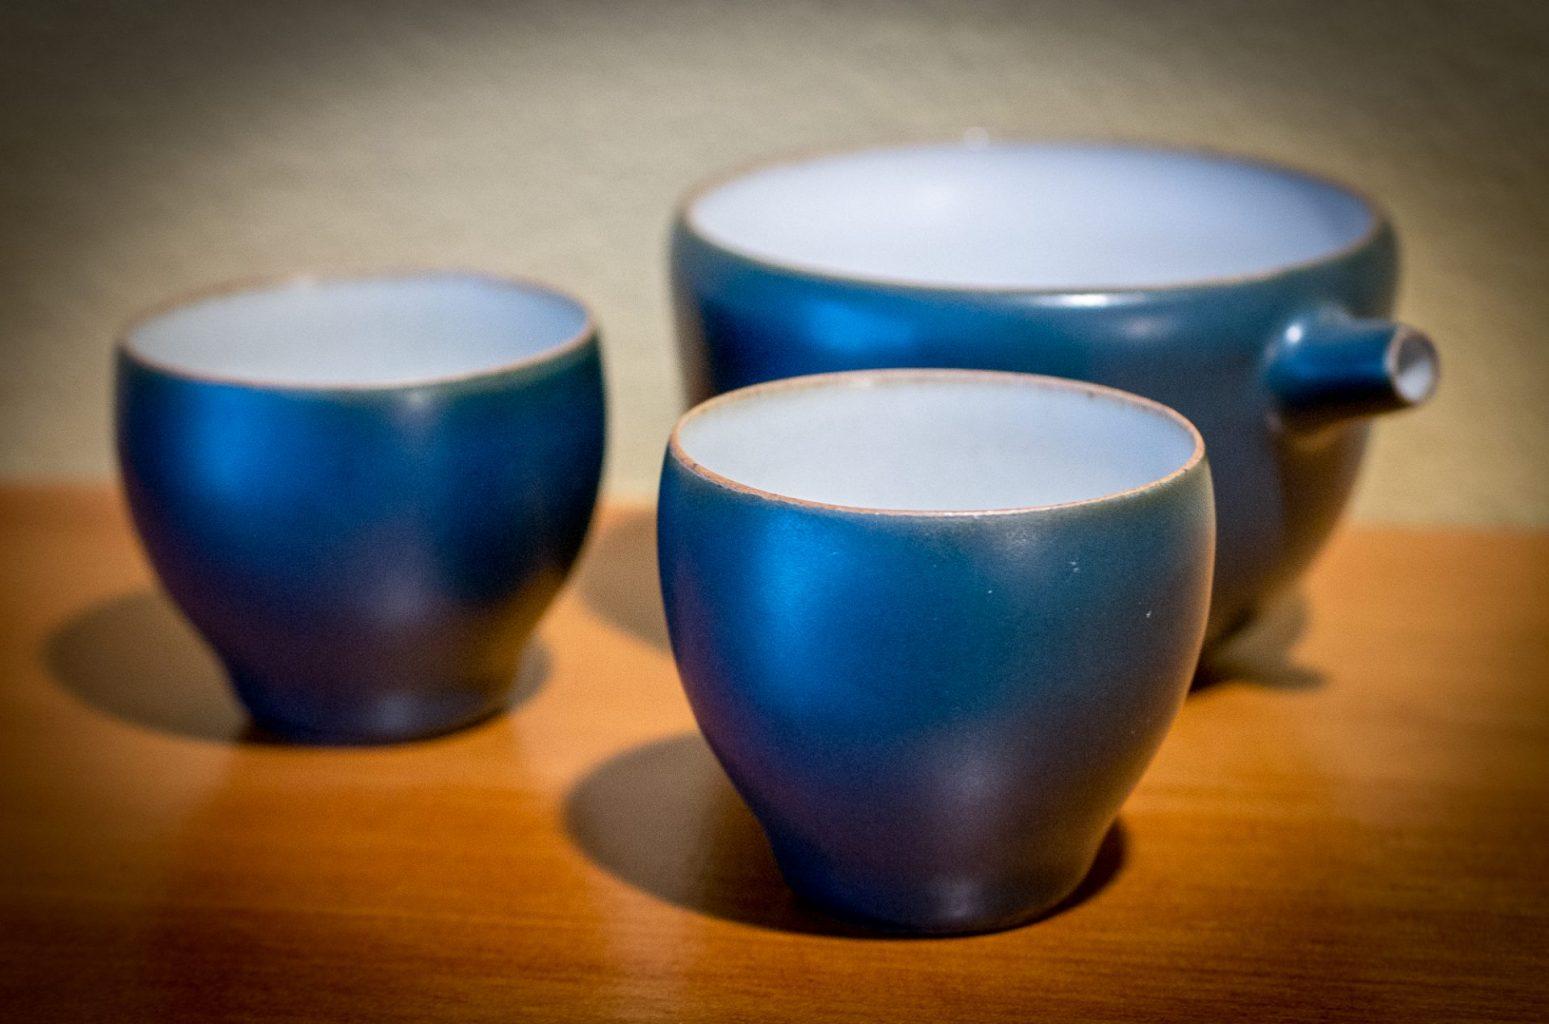 Tea set from China